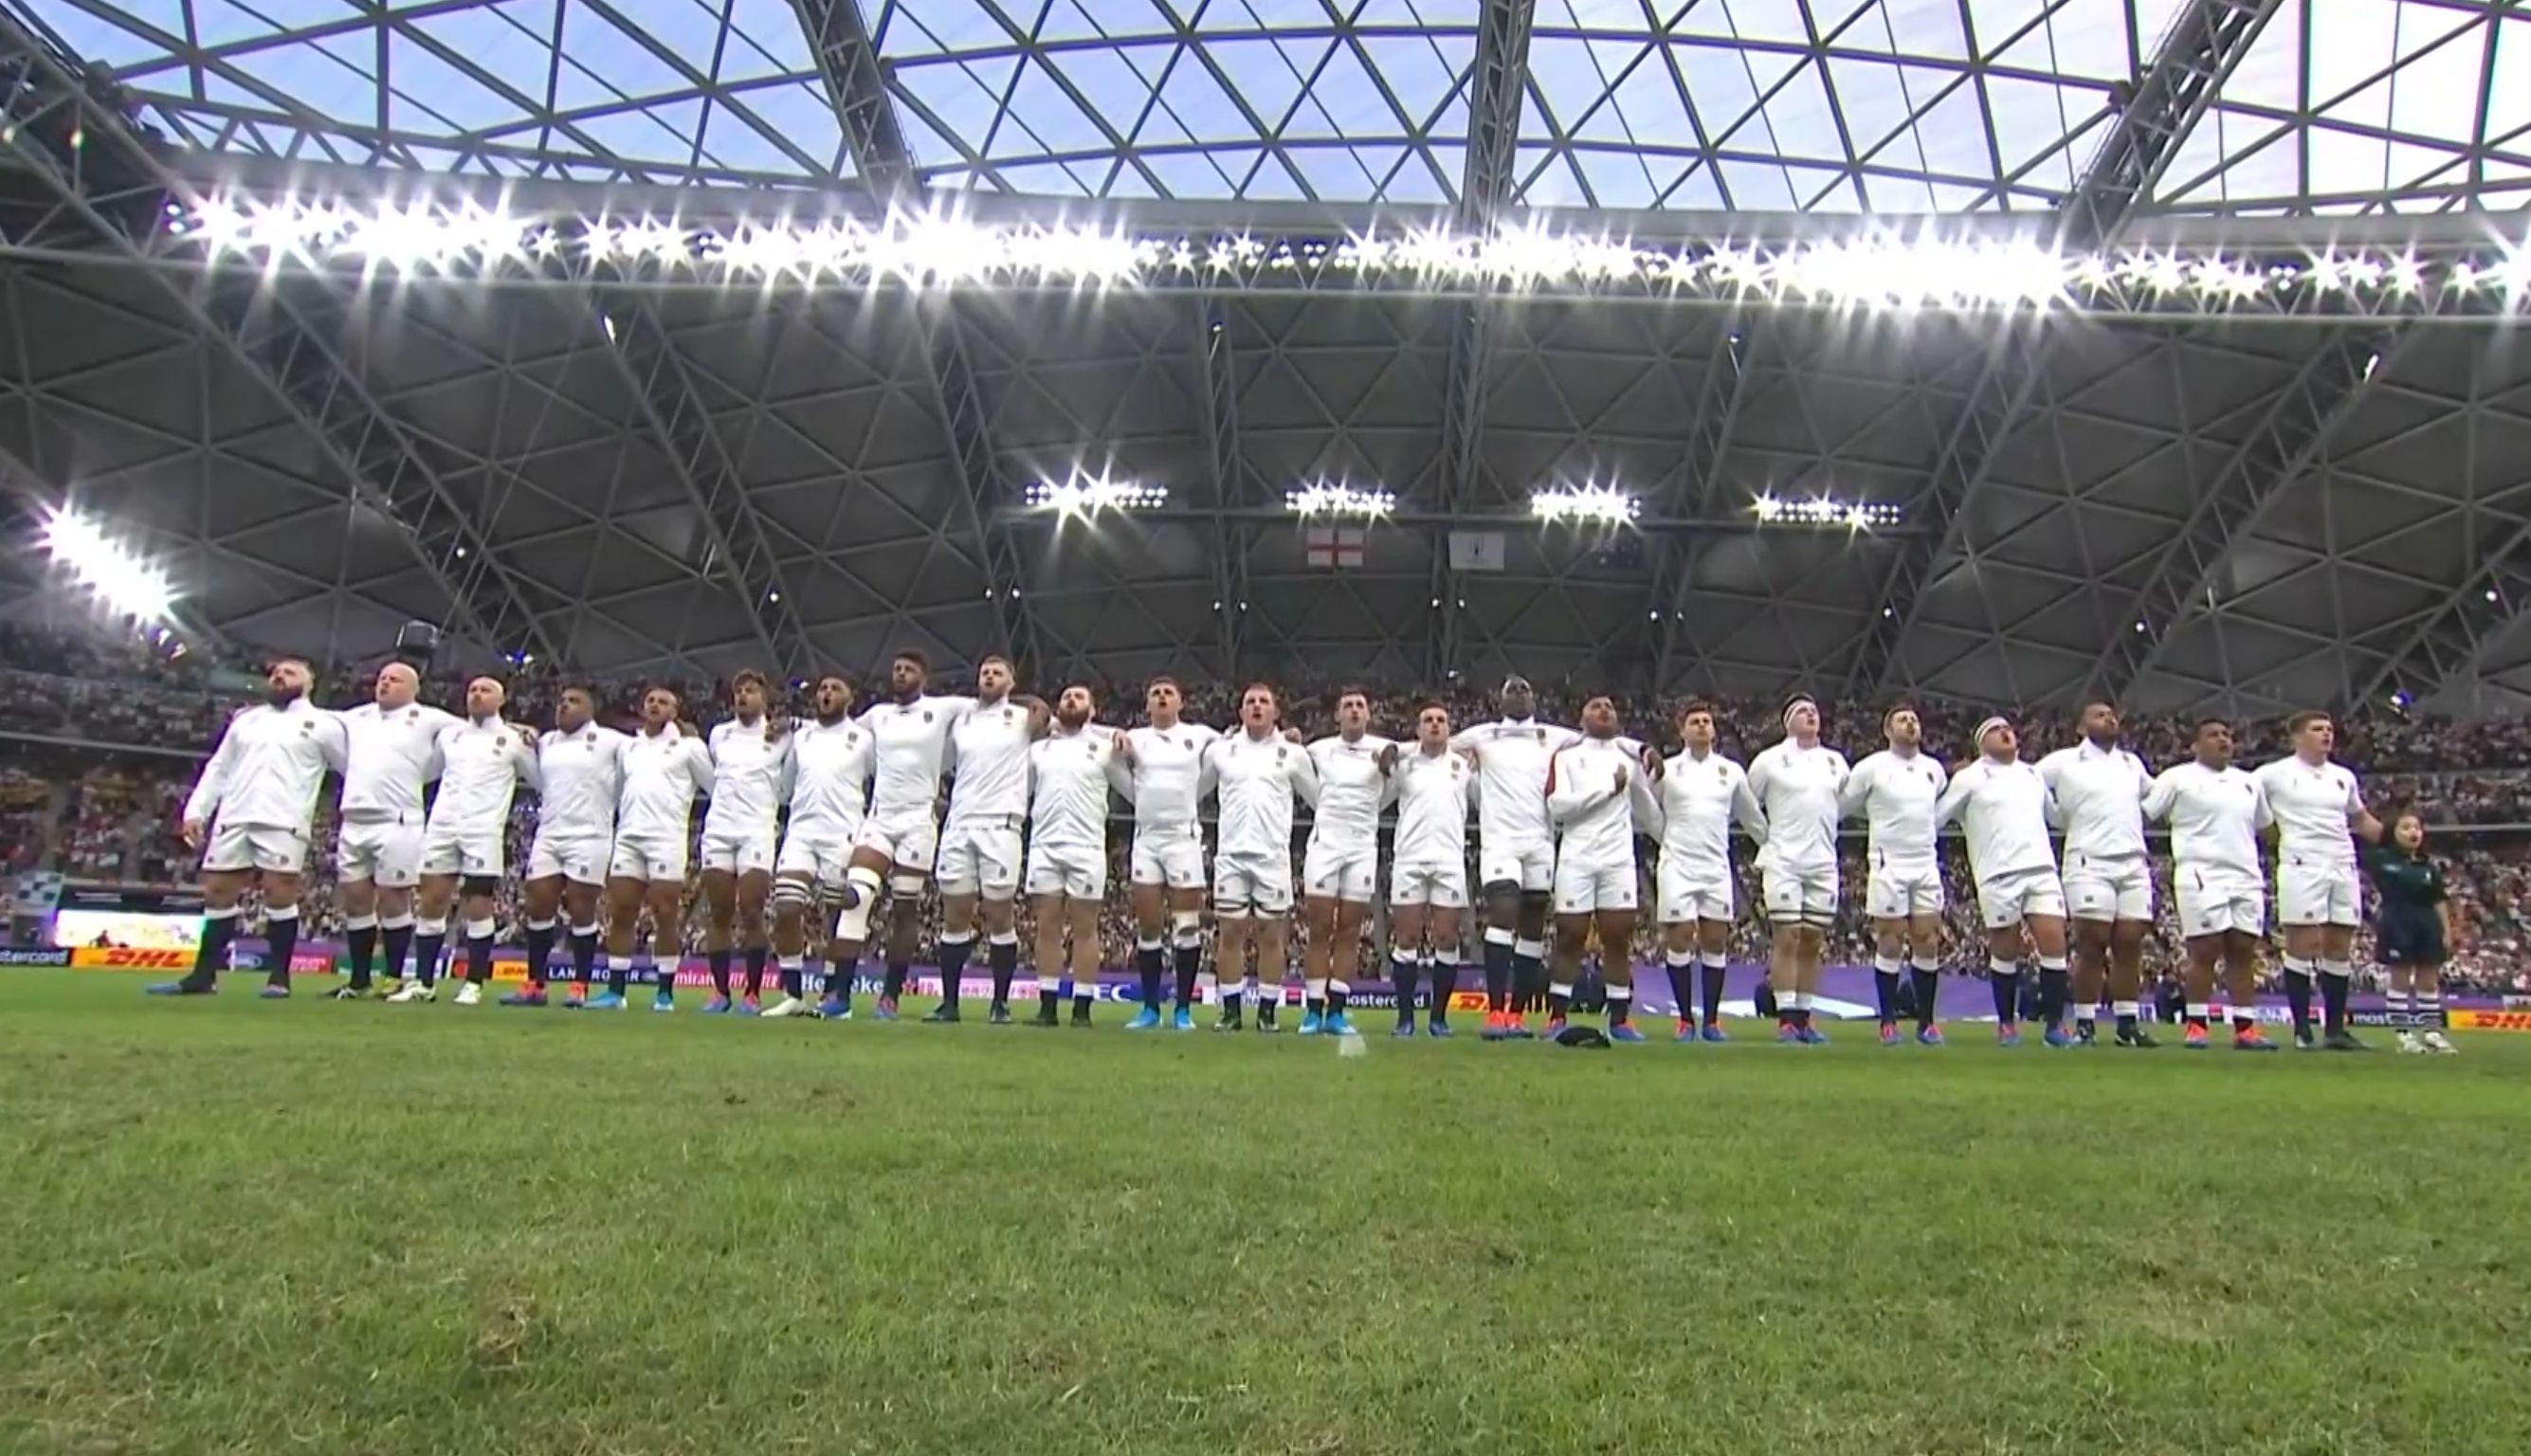 Sais Tu Qui Tu Es Hs Noir Poster England Rugby Team Rugby World Cup Rugby